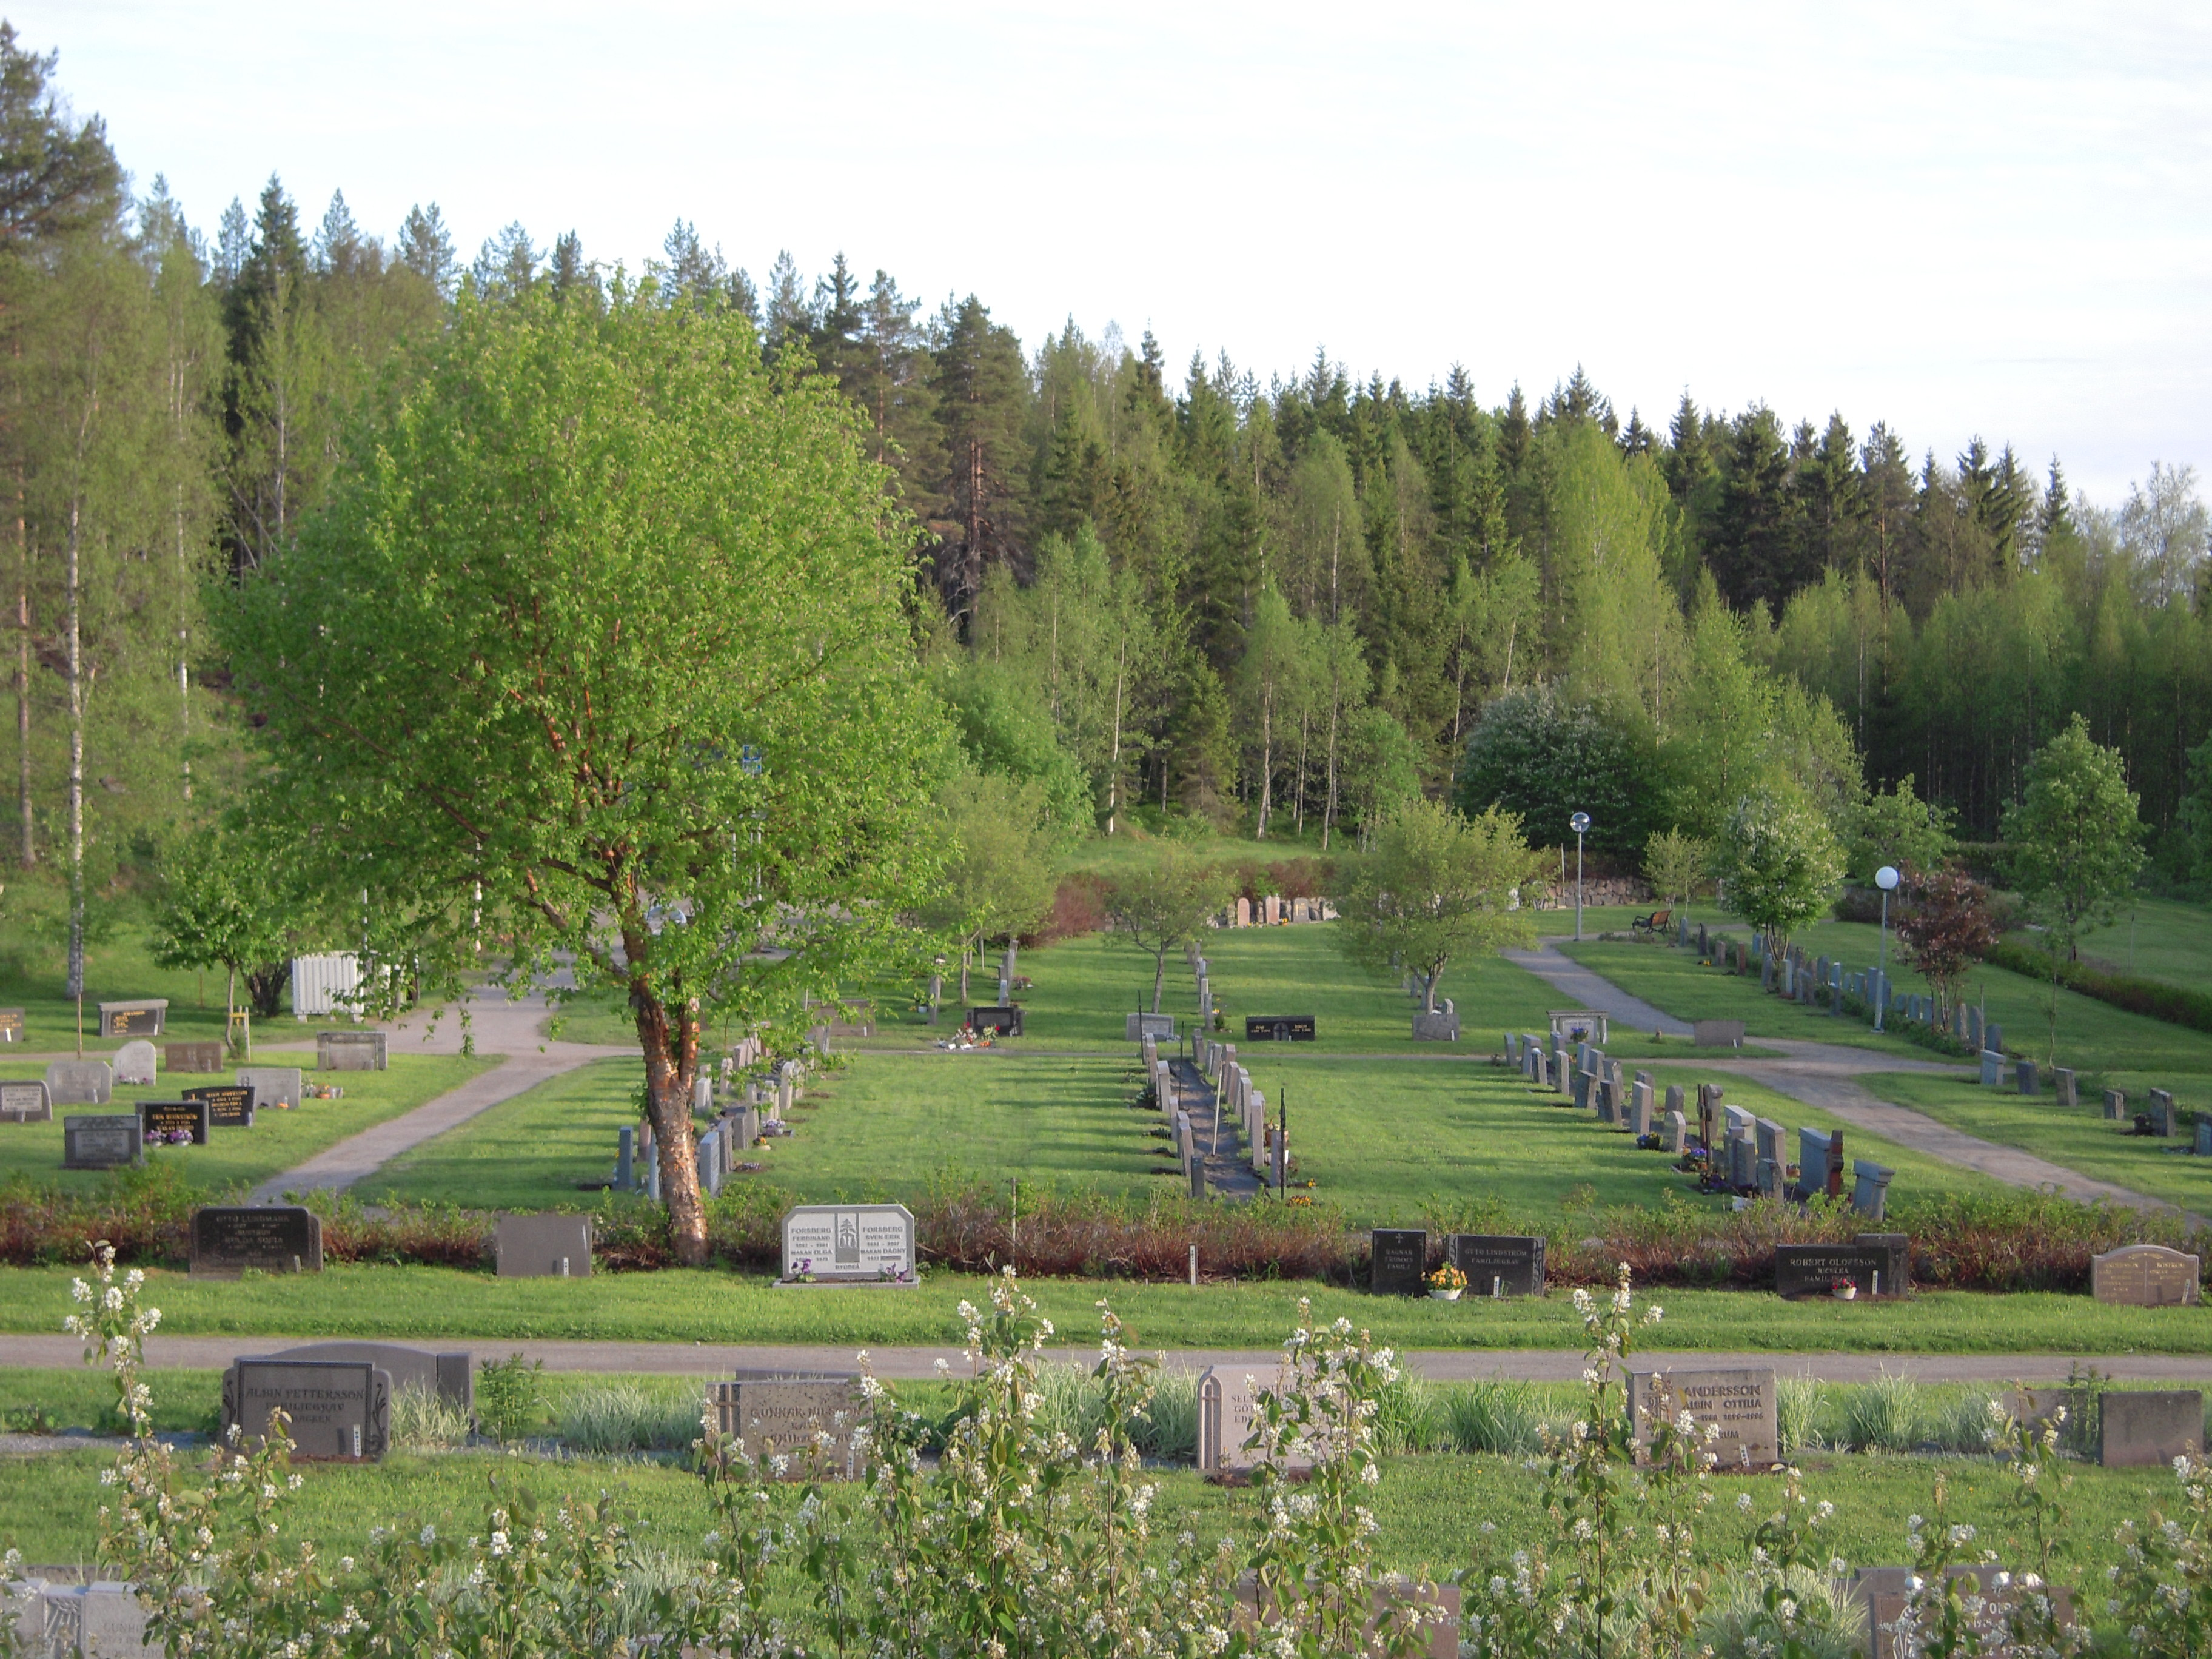 Bygdeå Church, Västerbotten, Sweden